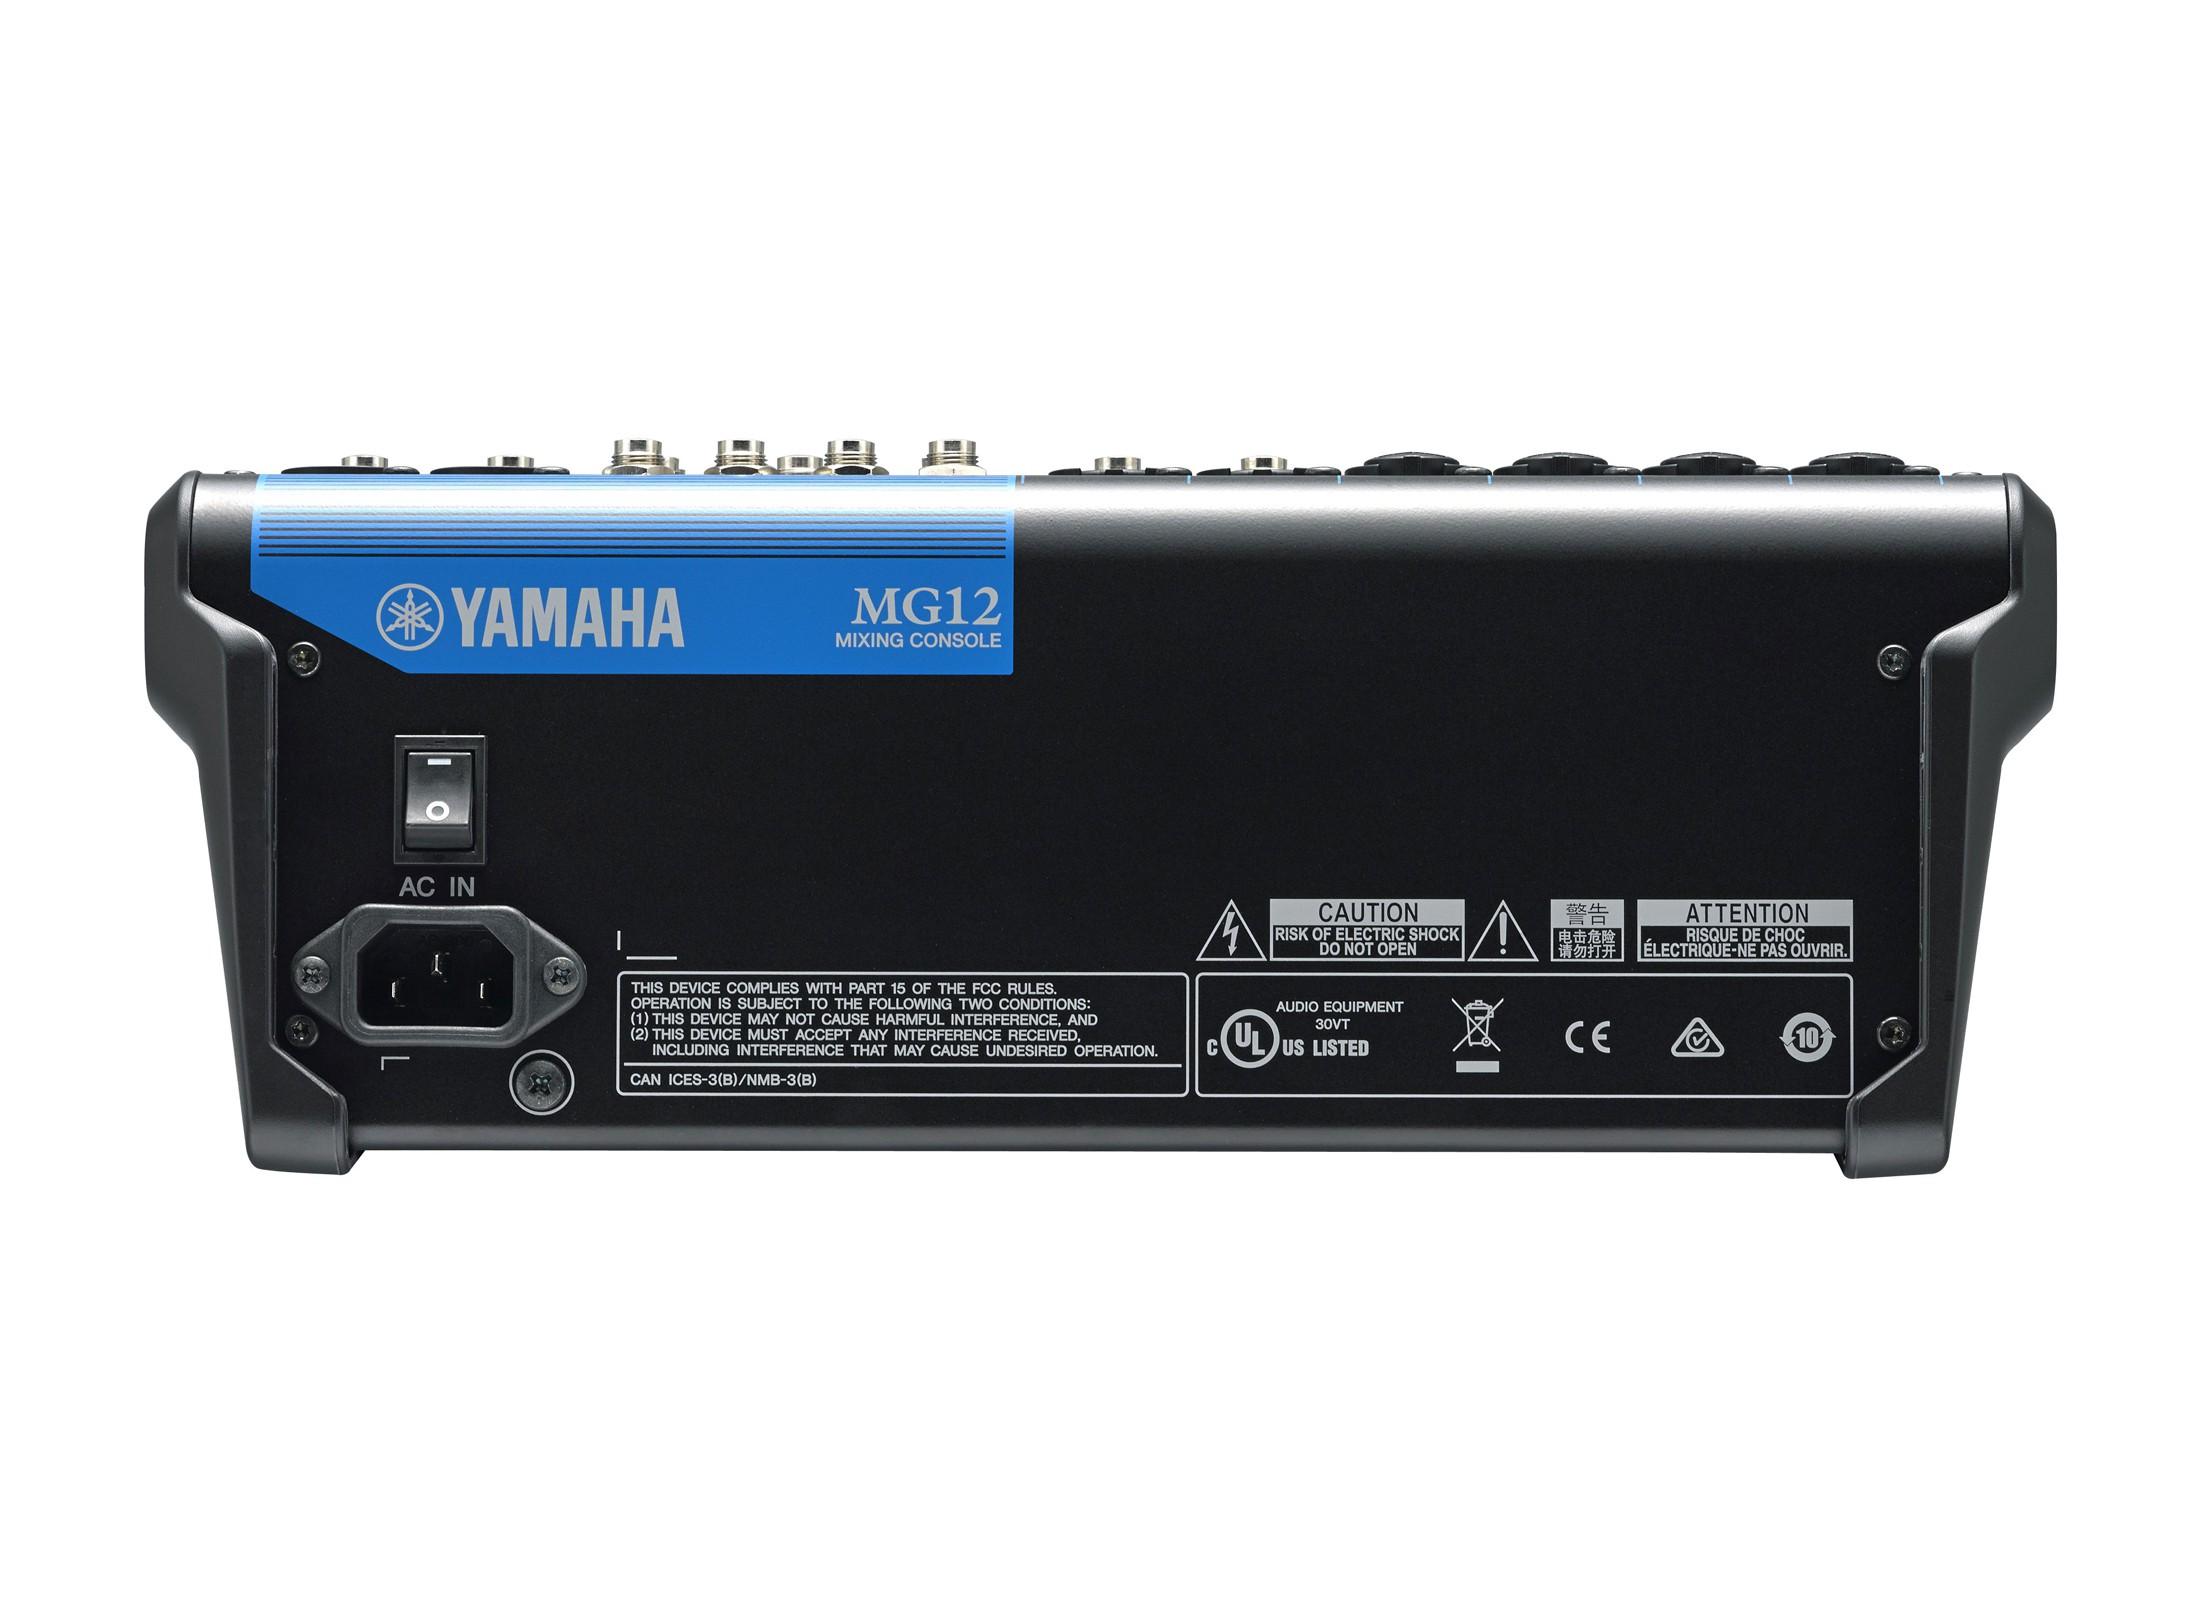 Yamaha Mg 12 Compact Mixer Online At Low Prices At Huss